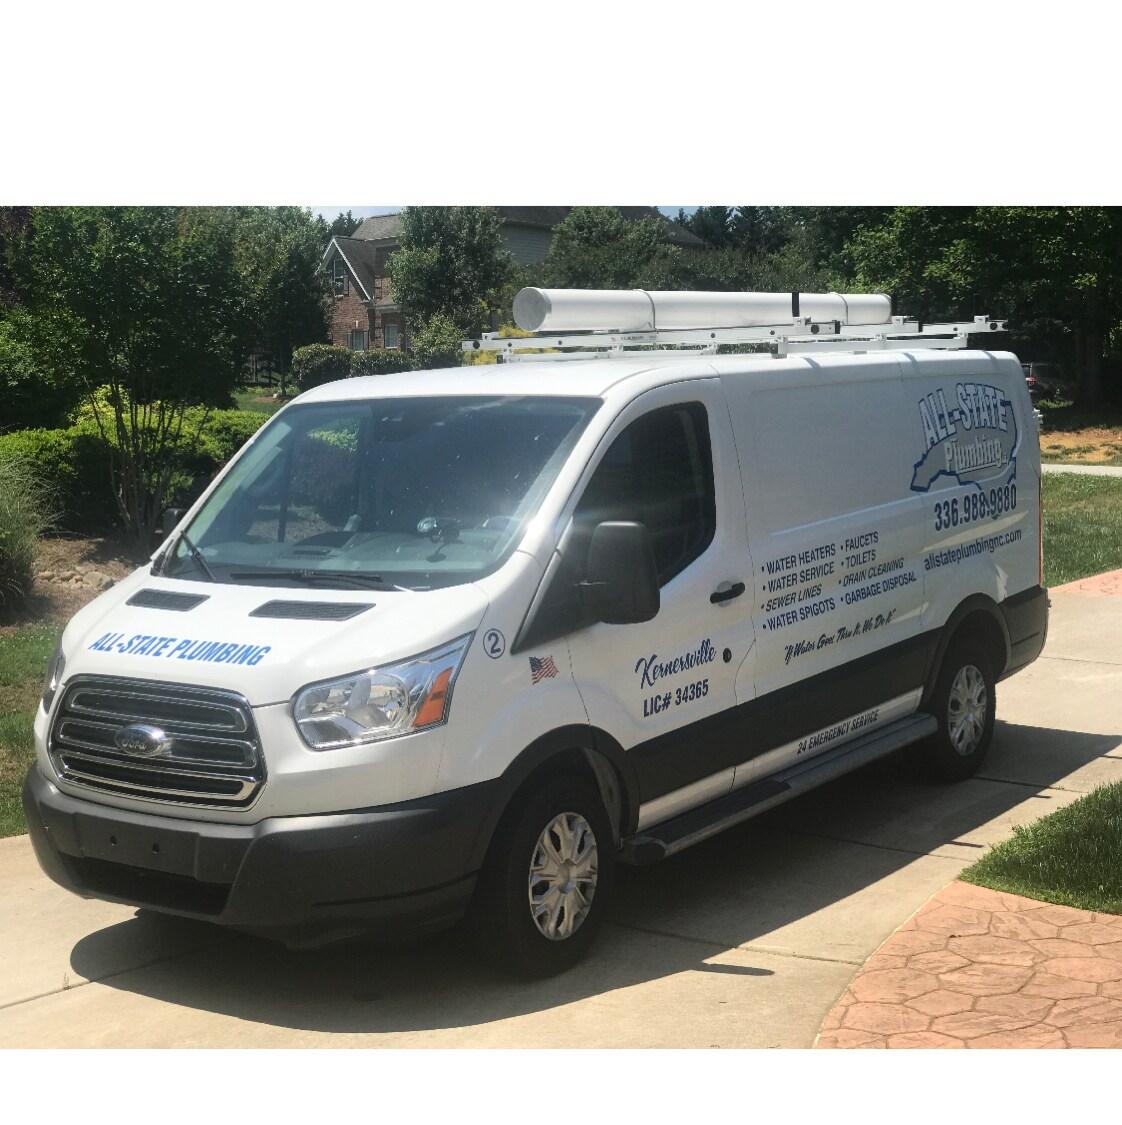 All-State plumbing